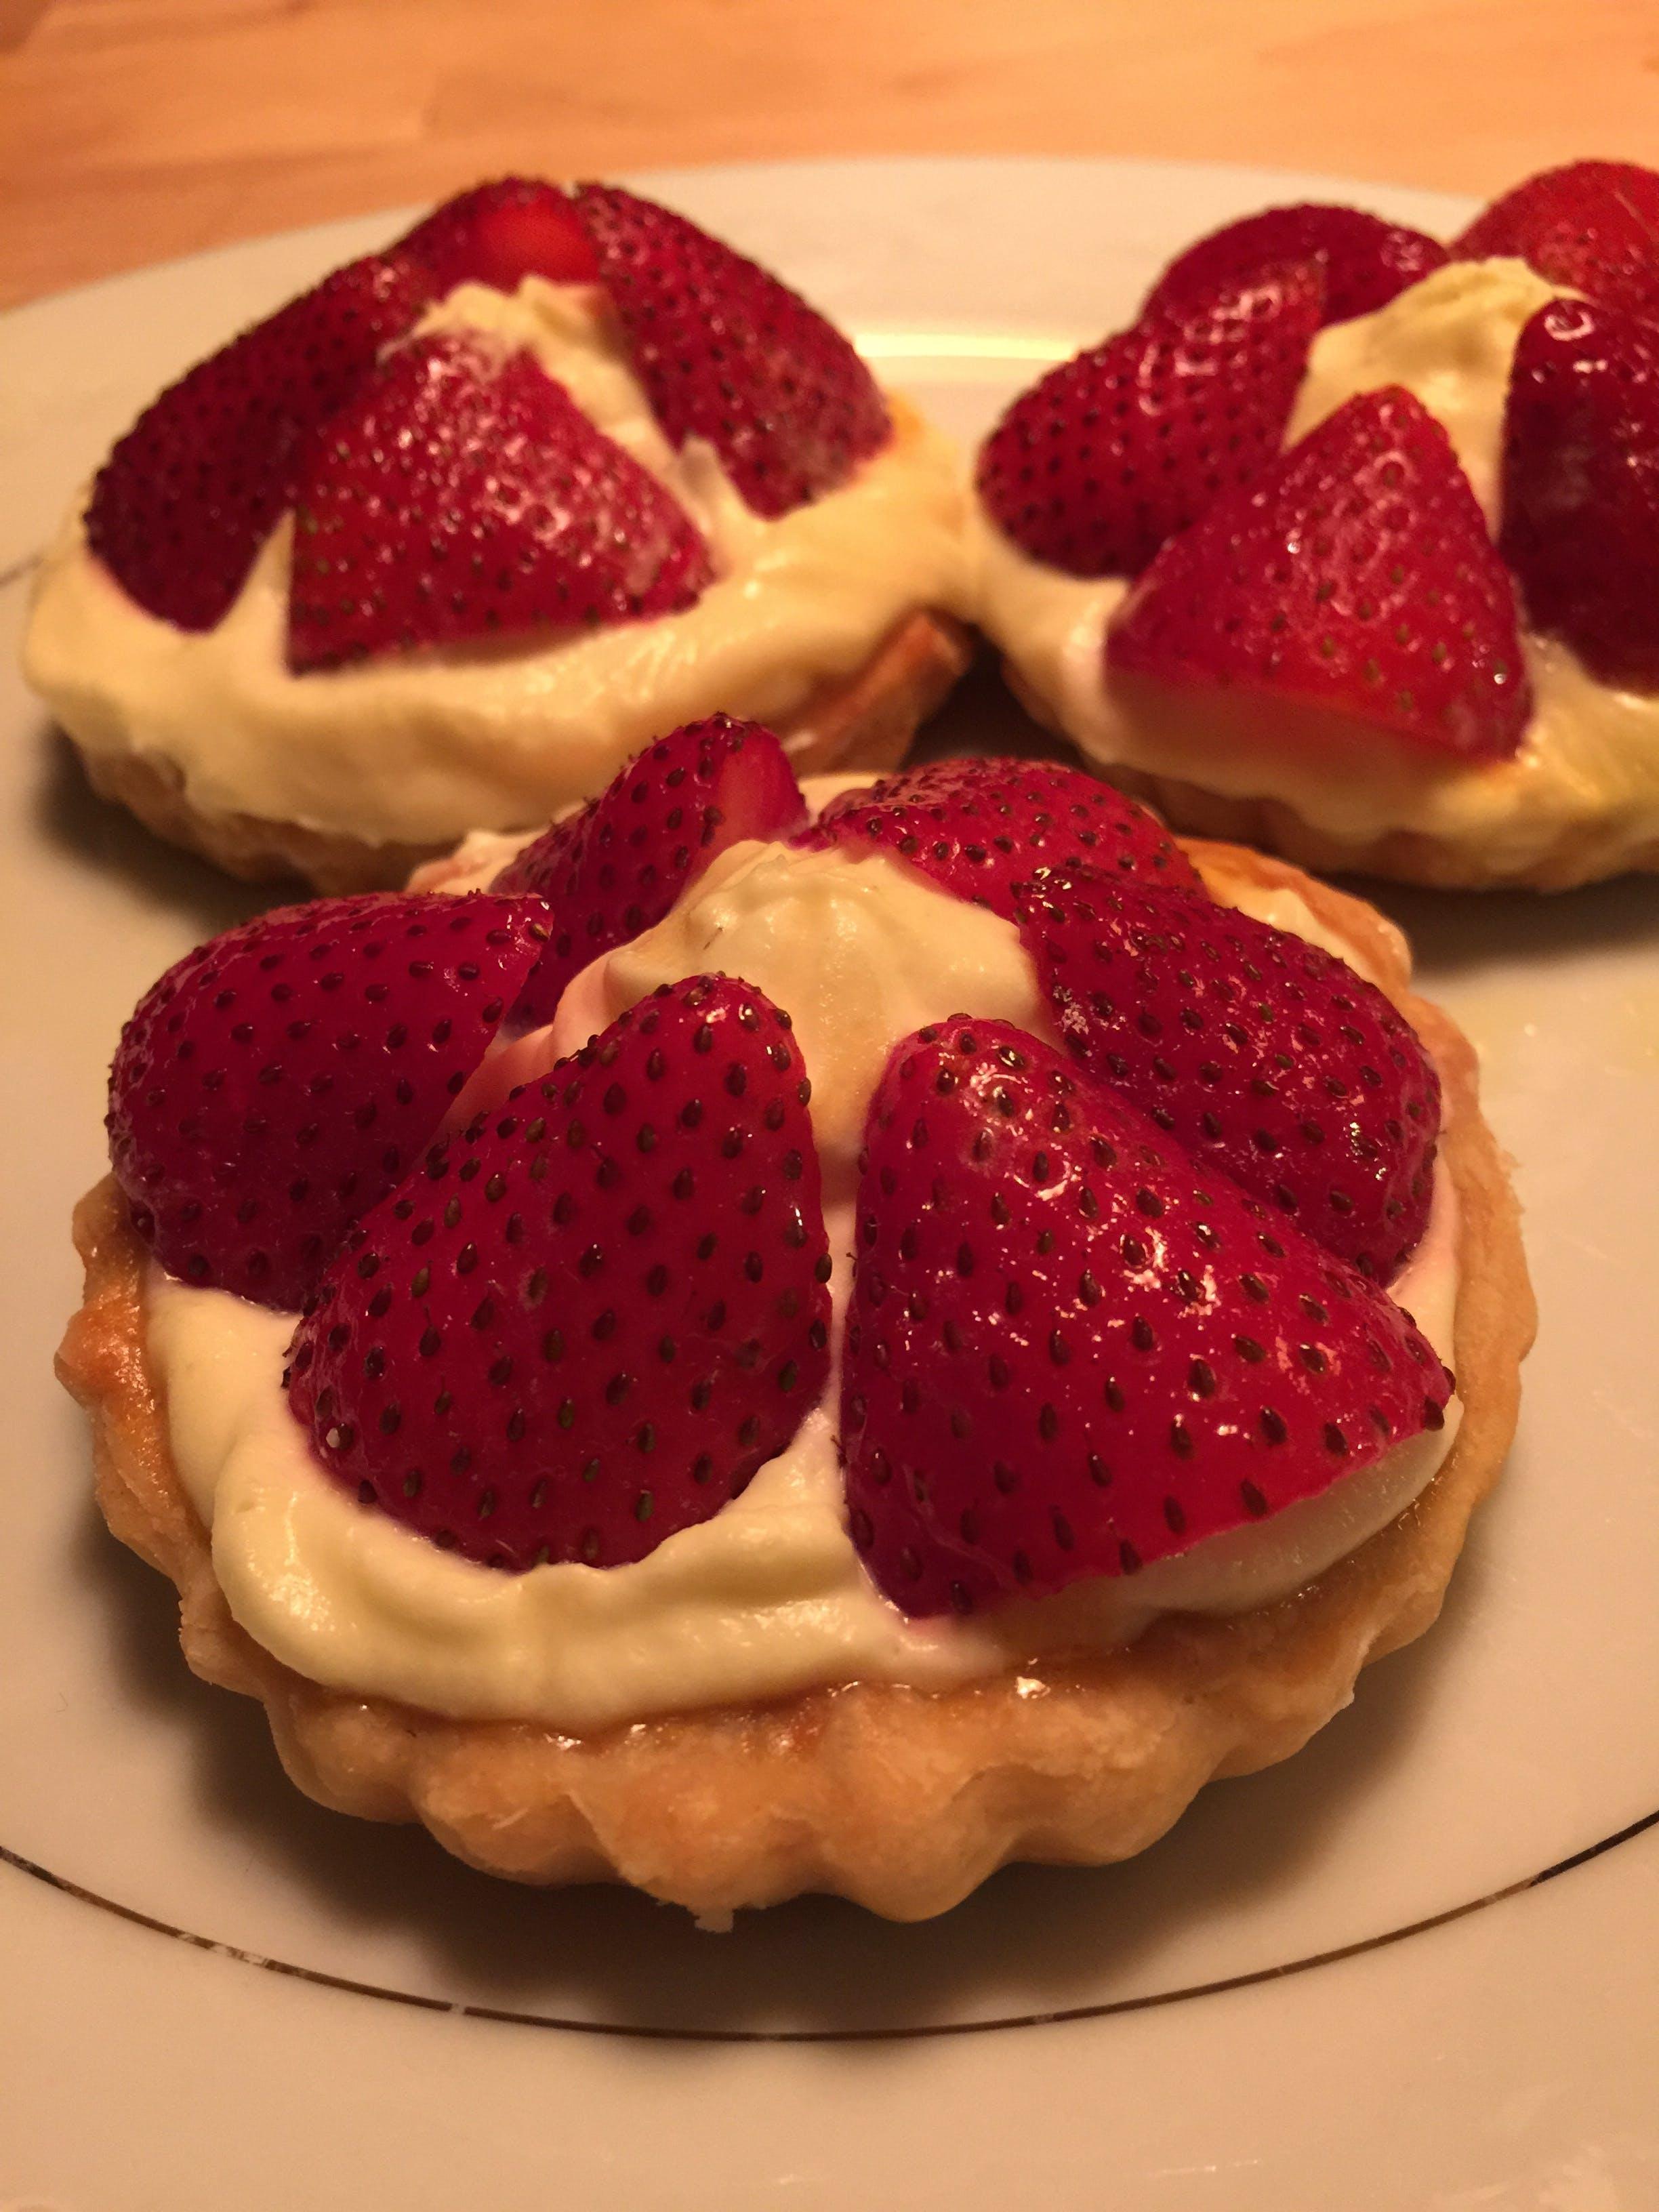 Free stock photo of dessert, pastry, strawberries, tarts